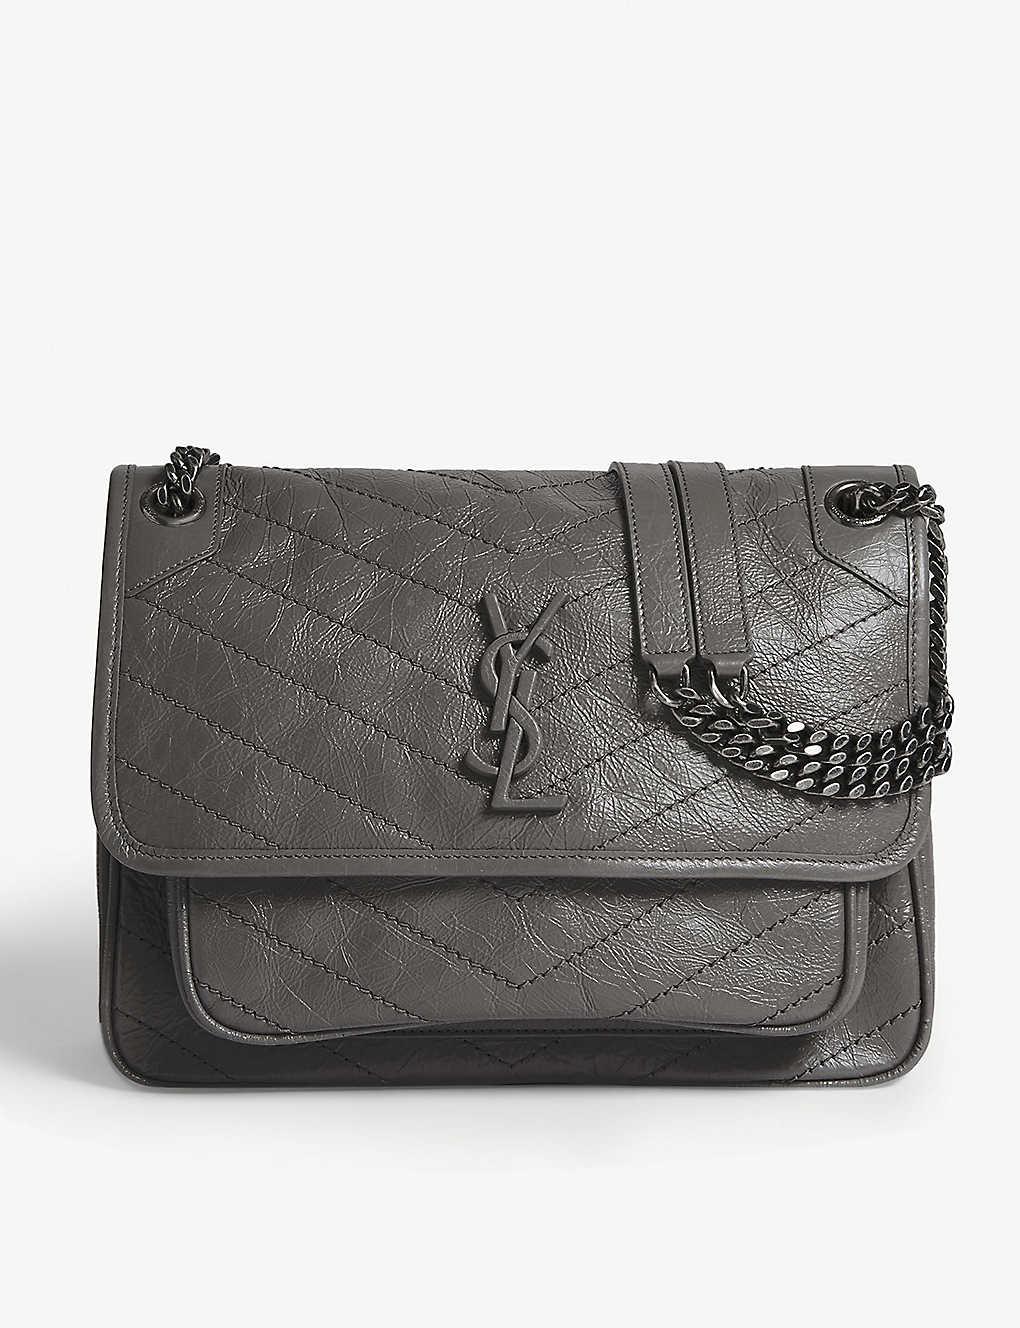 123033f3a21 SAINT LAURENT - Monogram Niki medium leather shoulder bag ...